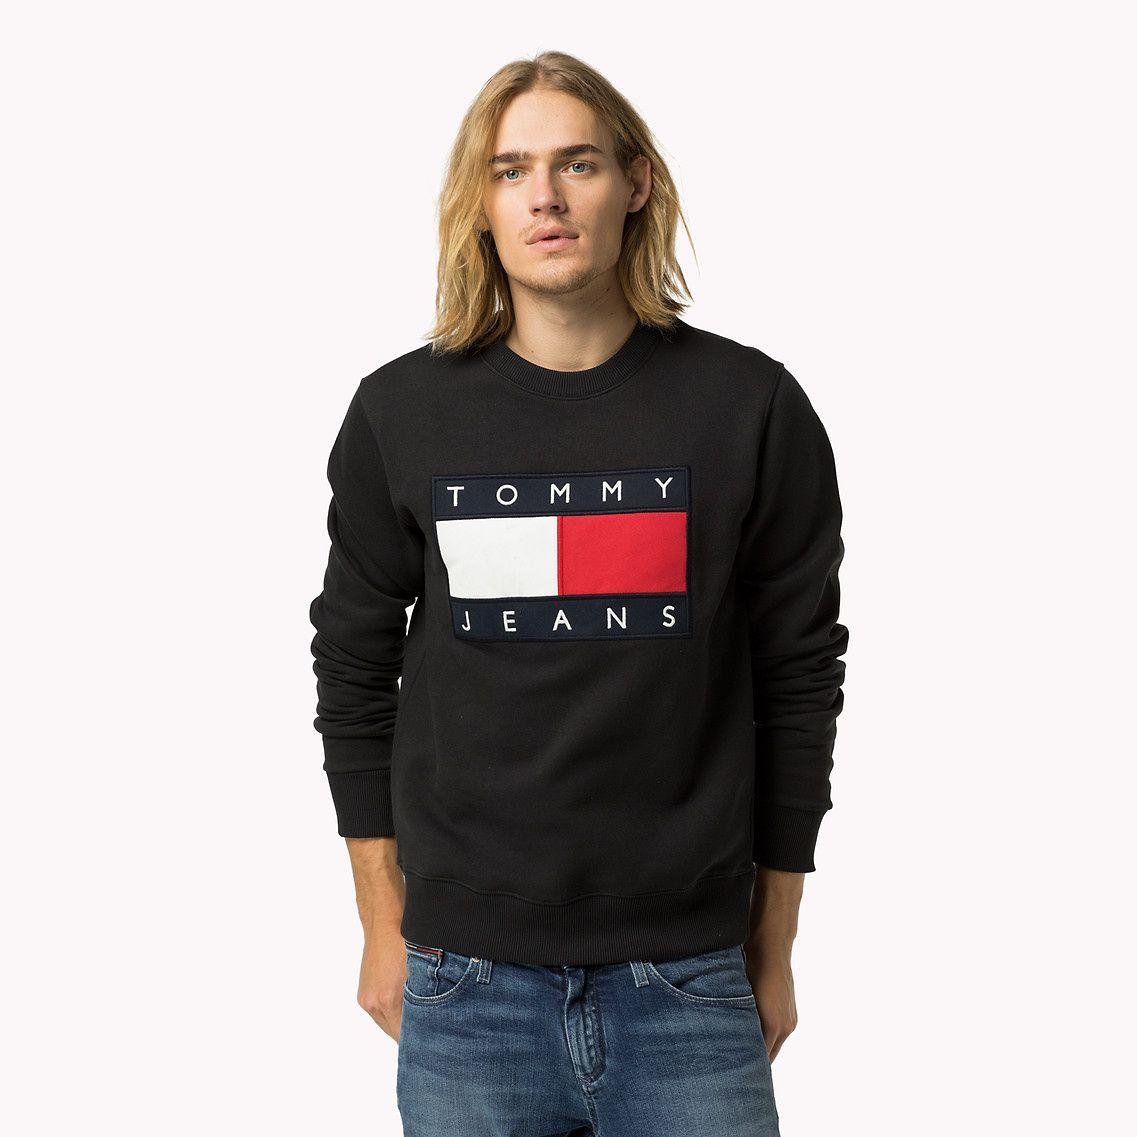 Cotton Fleece Logo Sweatshirt Black Tommy Hilfiger 8719253944703 Sweatshirts Tommy Hilfiger Fashion Tommy Hilfiger [ 1137 x 1137 Pixel ]